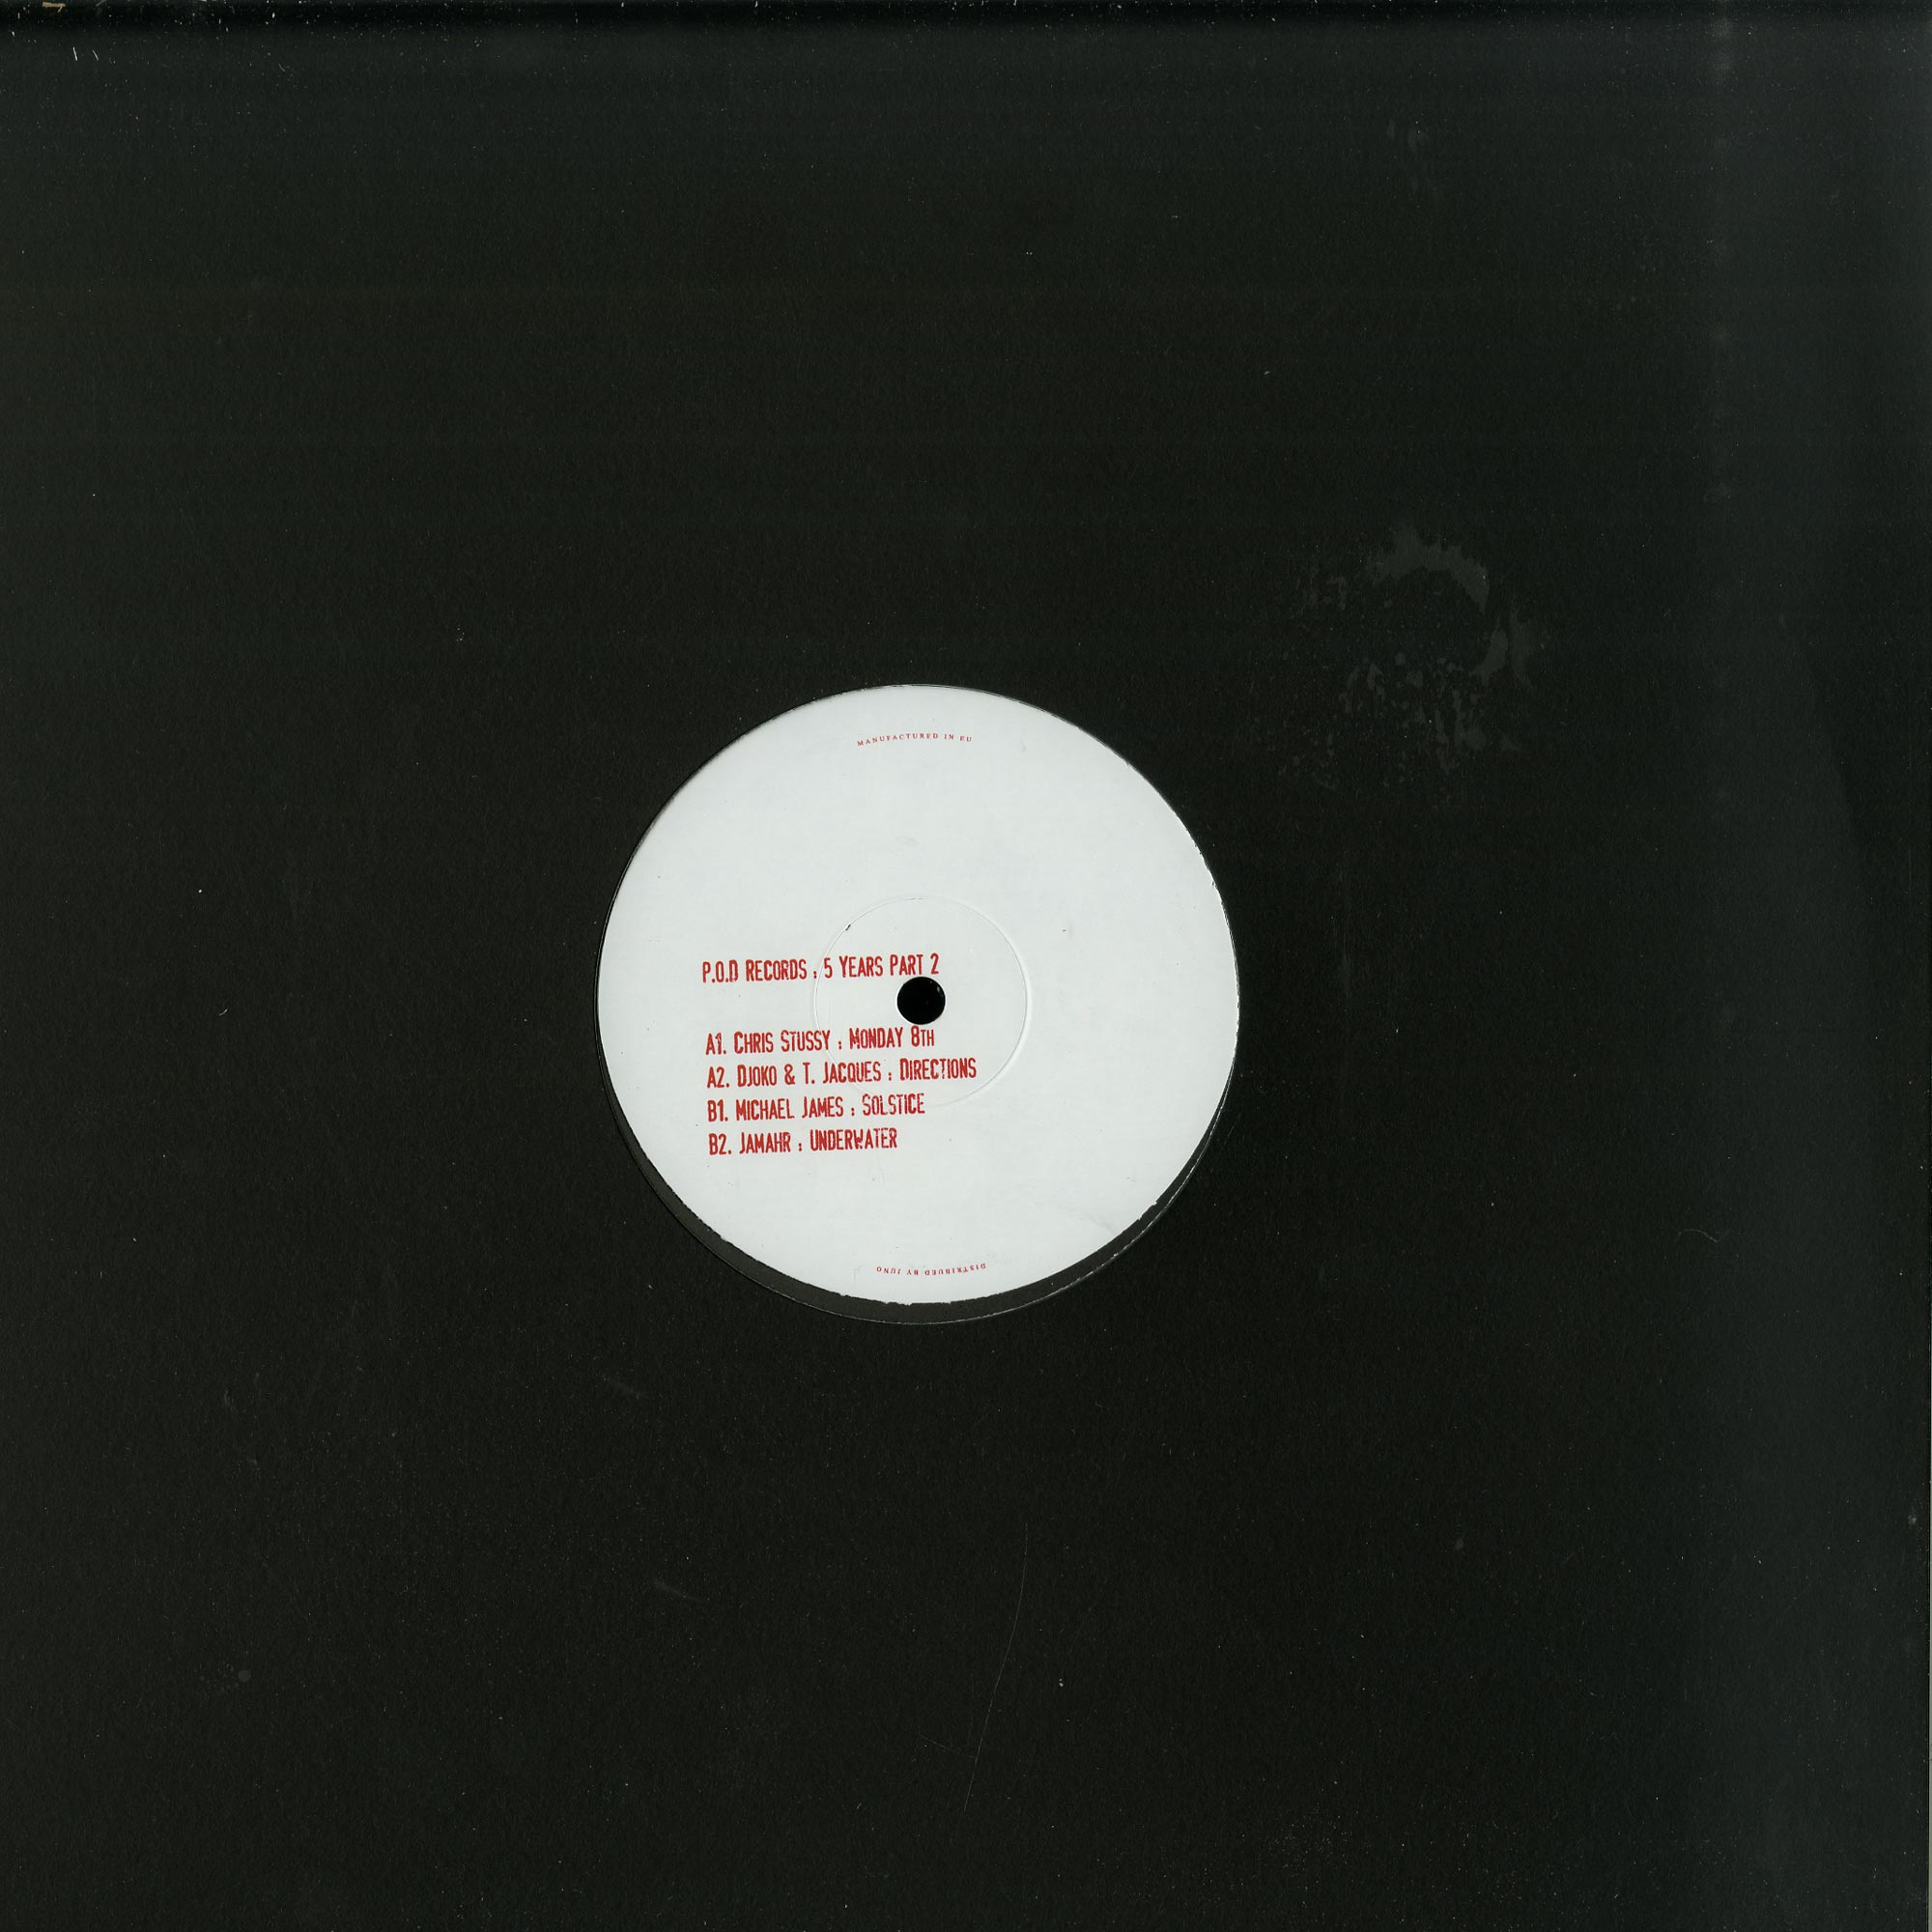 Chris Stussy / Djoko / T Jacques / Michael James / Jamahr - POD RECORDS : 5 YEARS PART 2